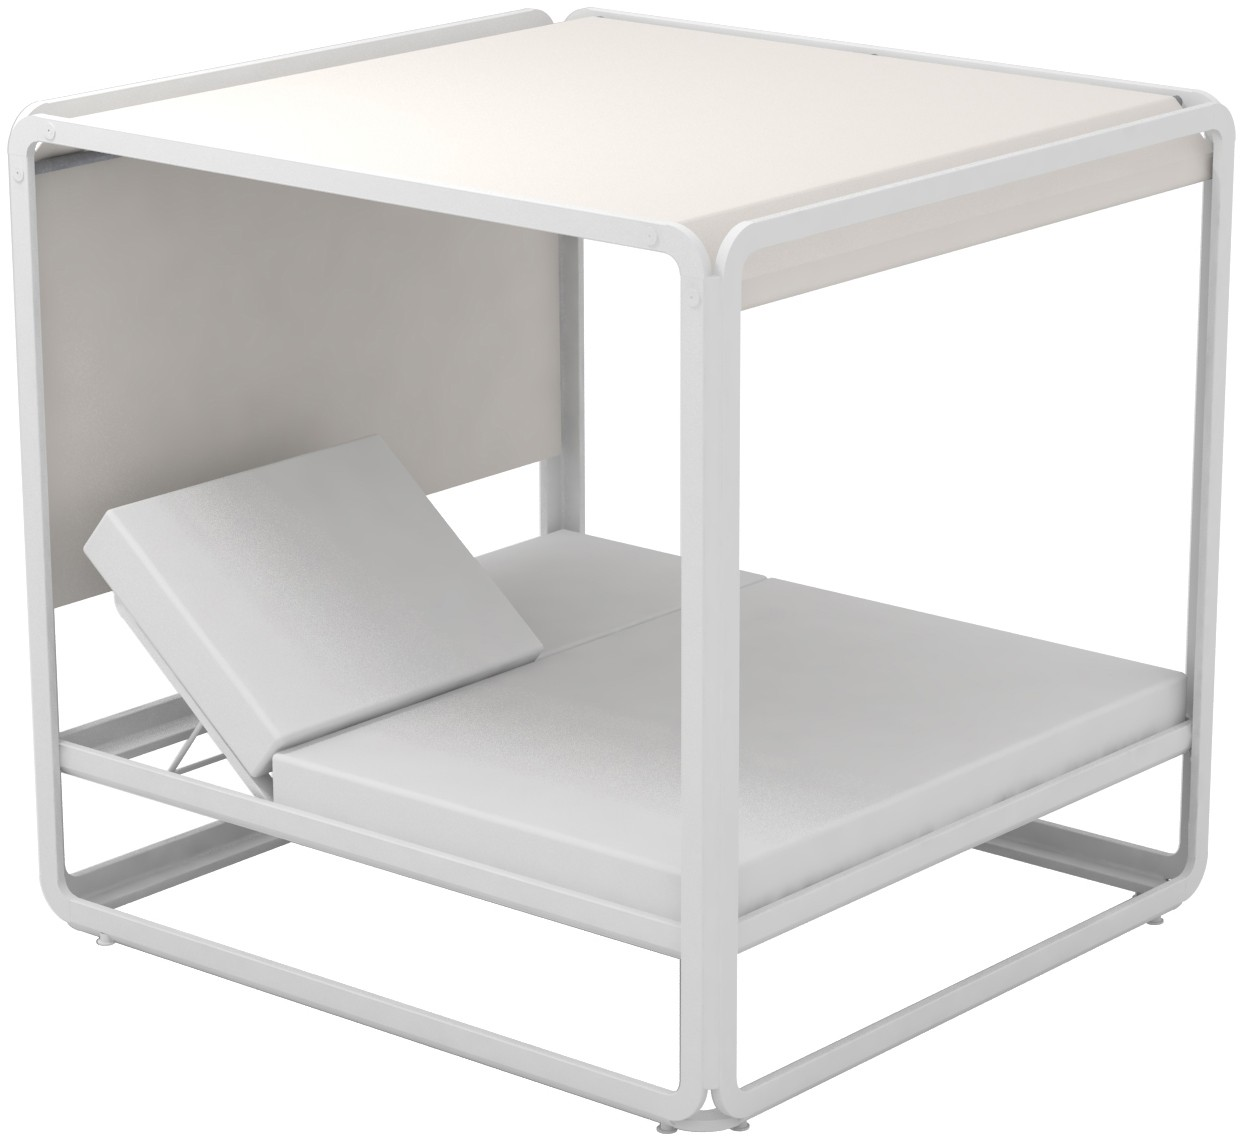 Lounge Ezpeleta Cama Balinesa white sand Blancos Aluminio lacado Nautic